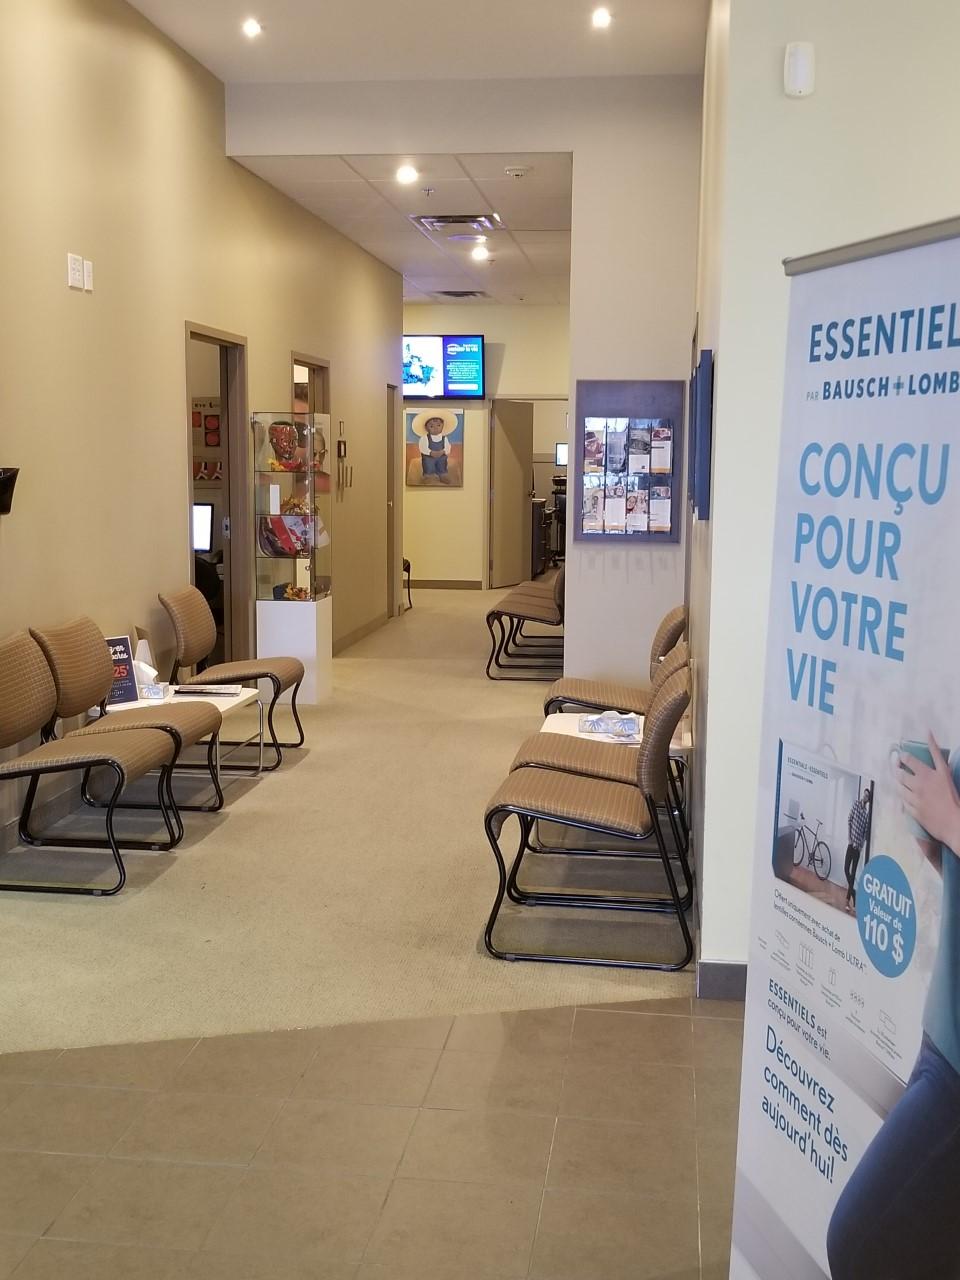 Visique - Granby   doctor   220 Rue Saint-Jude N, Granby, QC J2J 0C2, Canada   4503721031 OR +1 450-372-1031